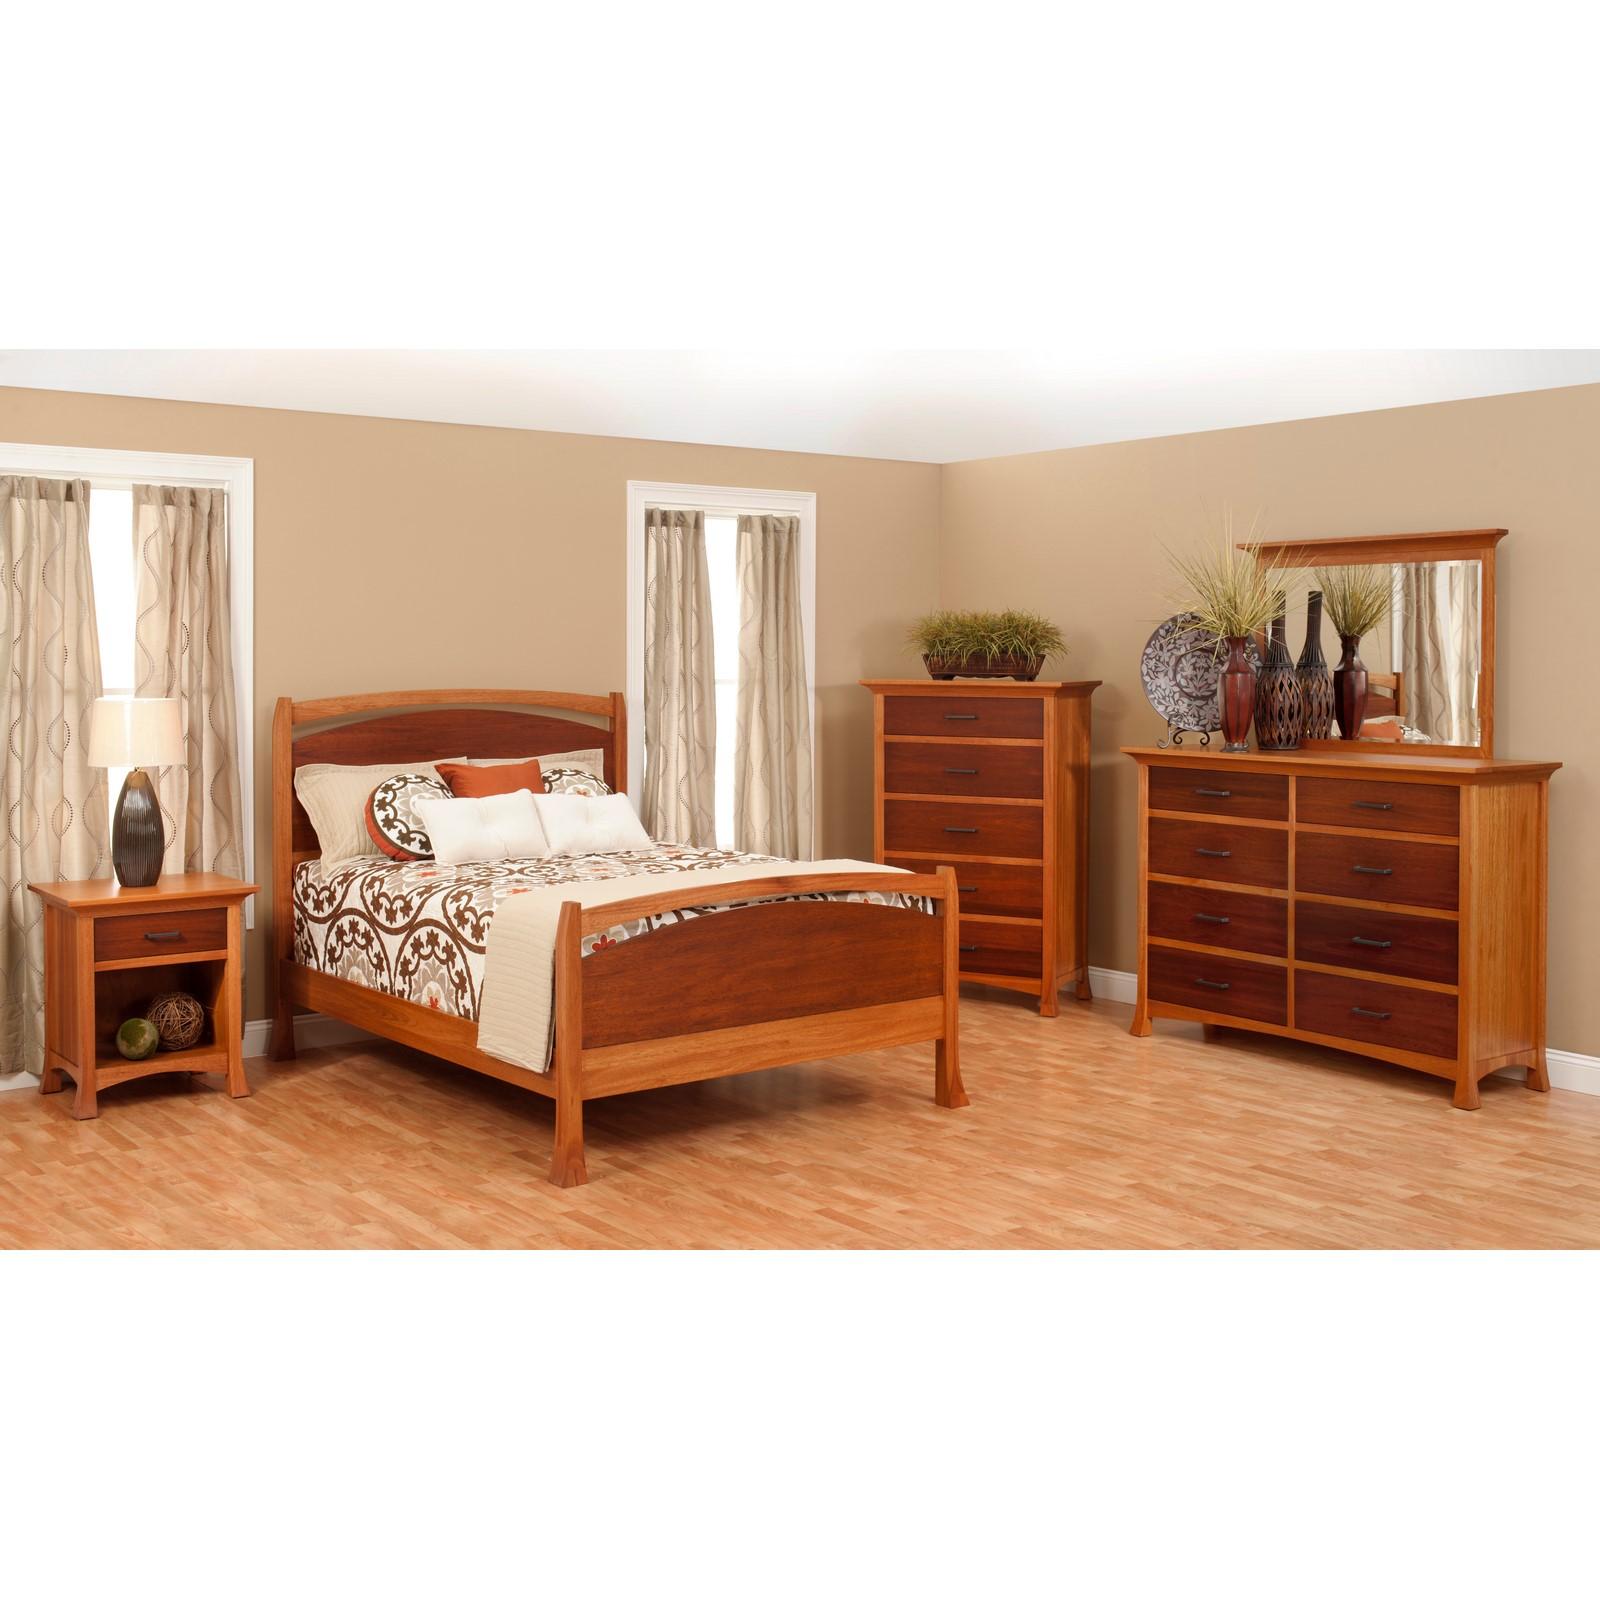 Oasis Bedroom Furniture Bedroom Ideas